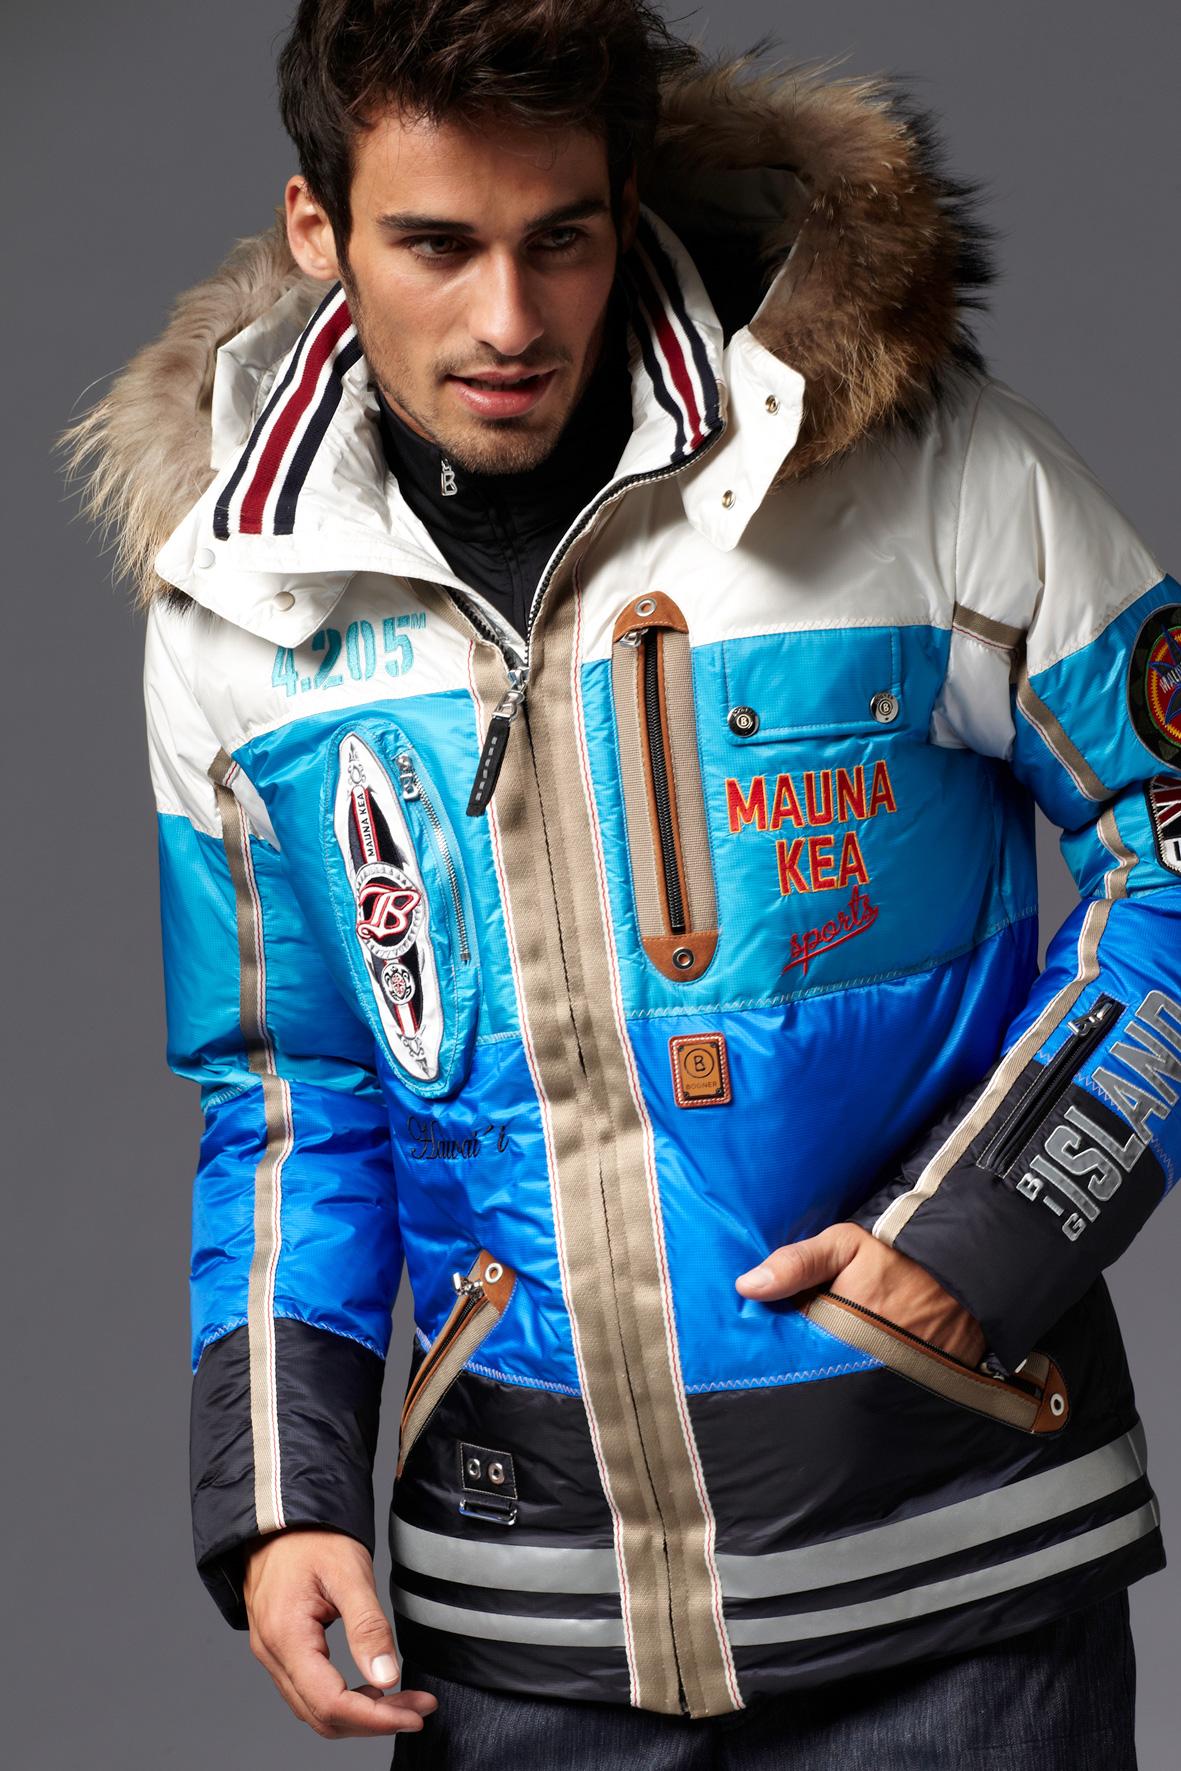 Des habits de ski de marque